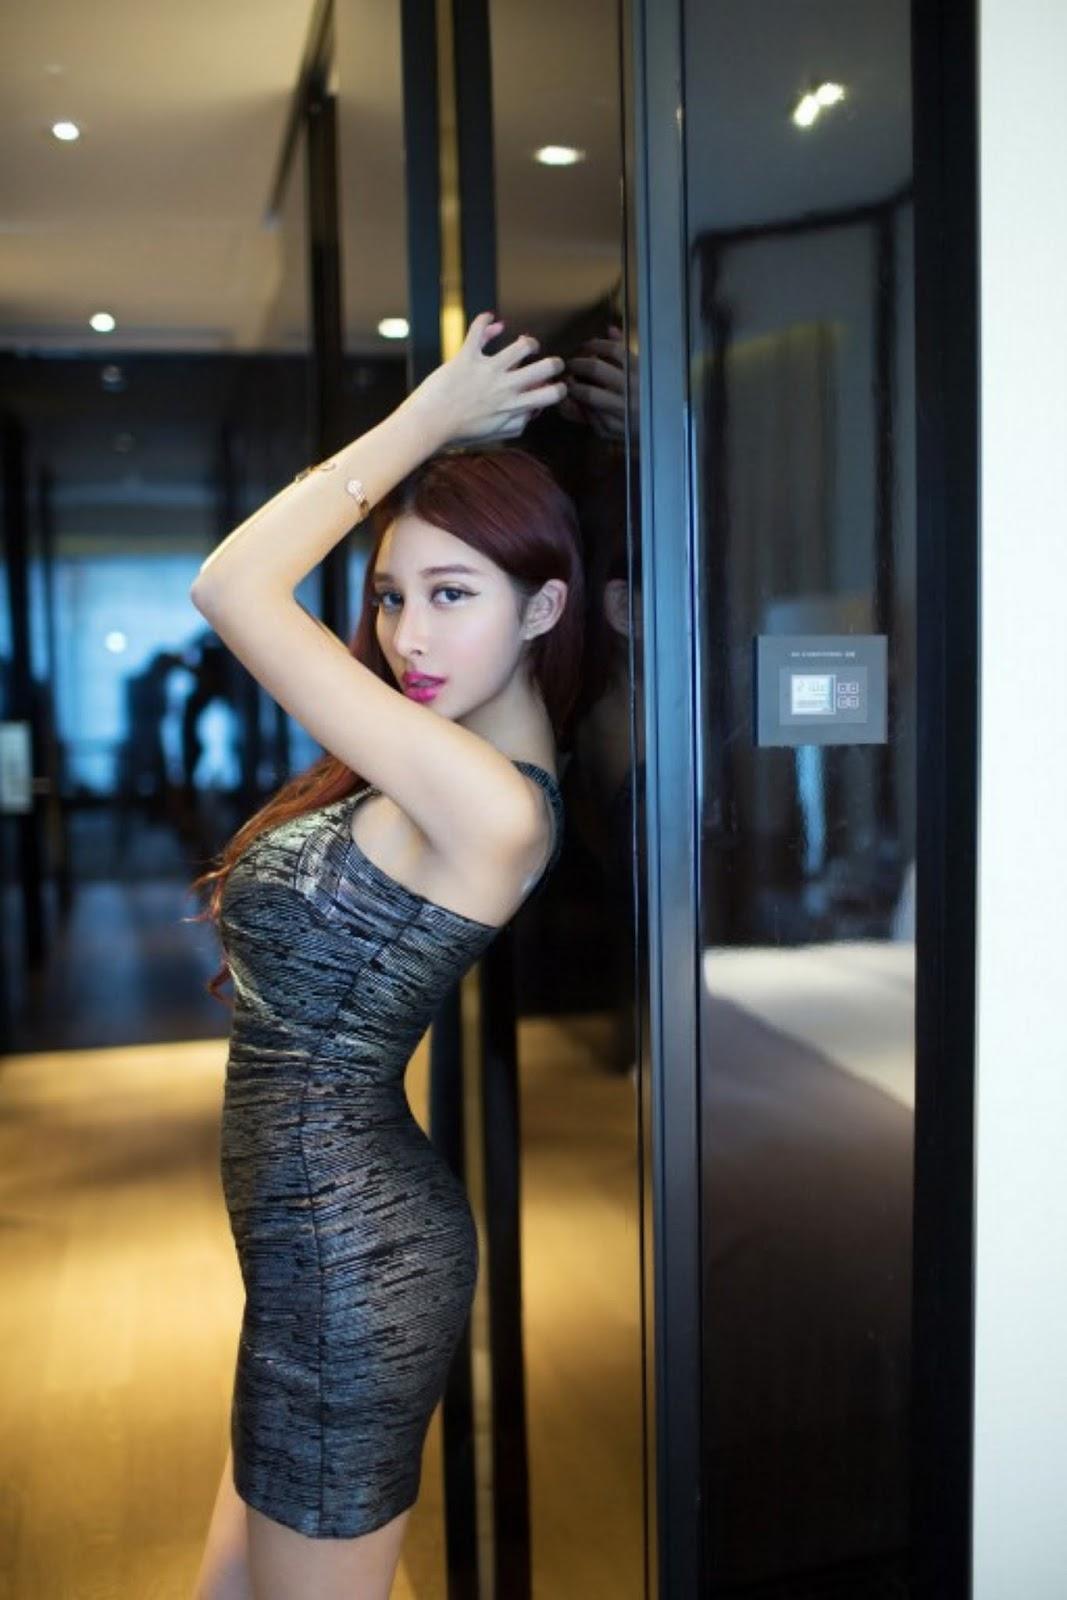 %25C2%25B1 %25C2%25B1 04 - Model Nude TUIGIRL NO.49 Beauty Body Tits